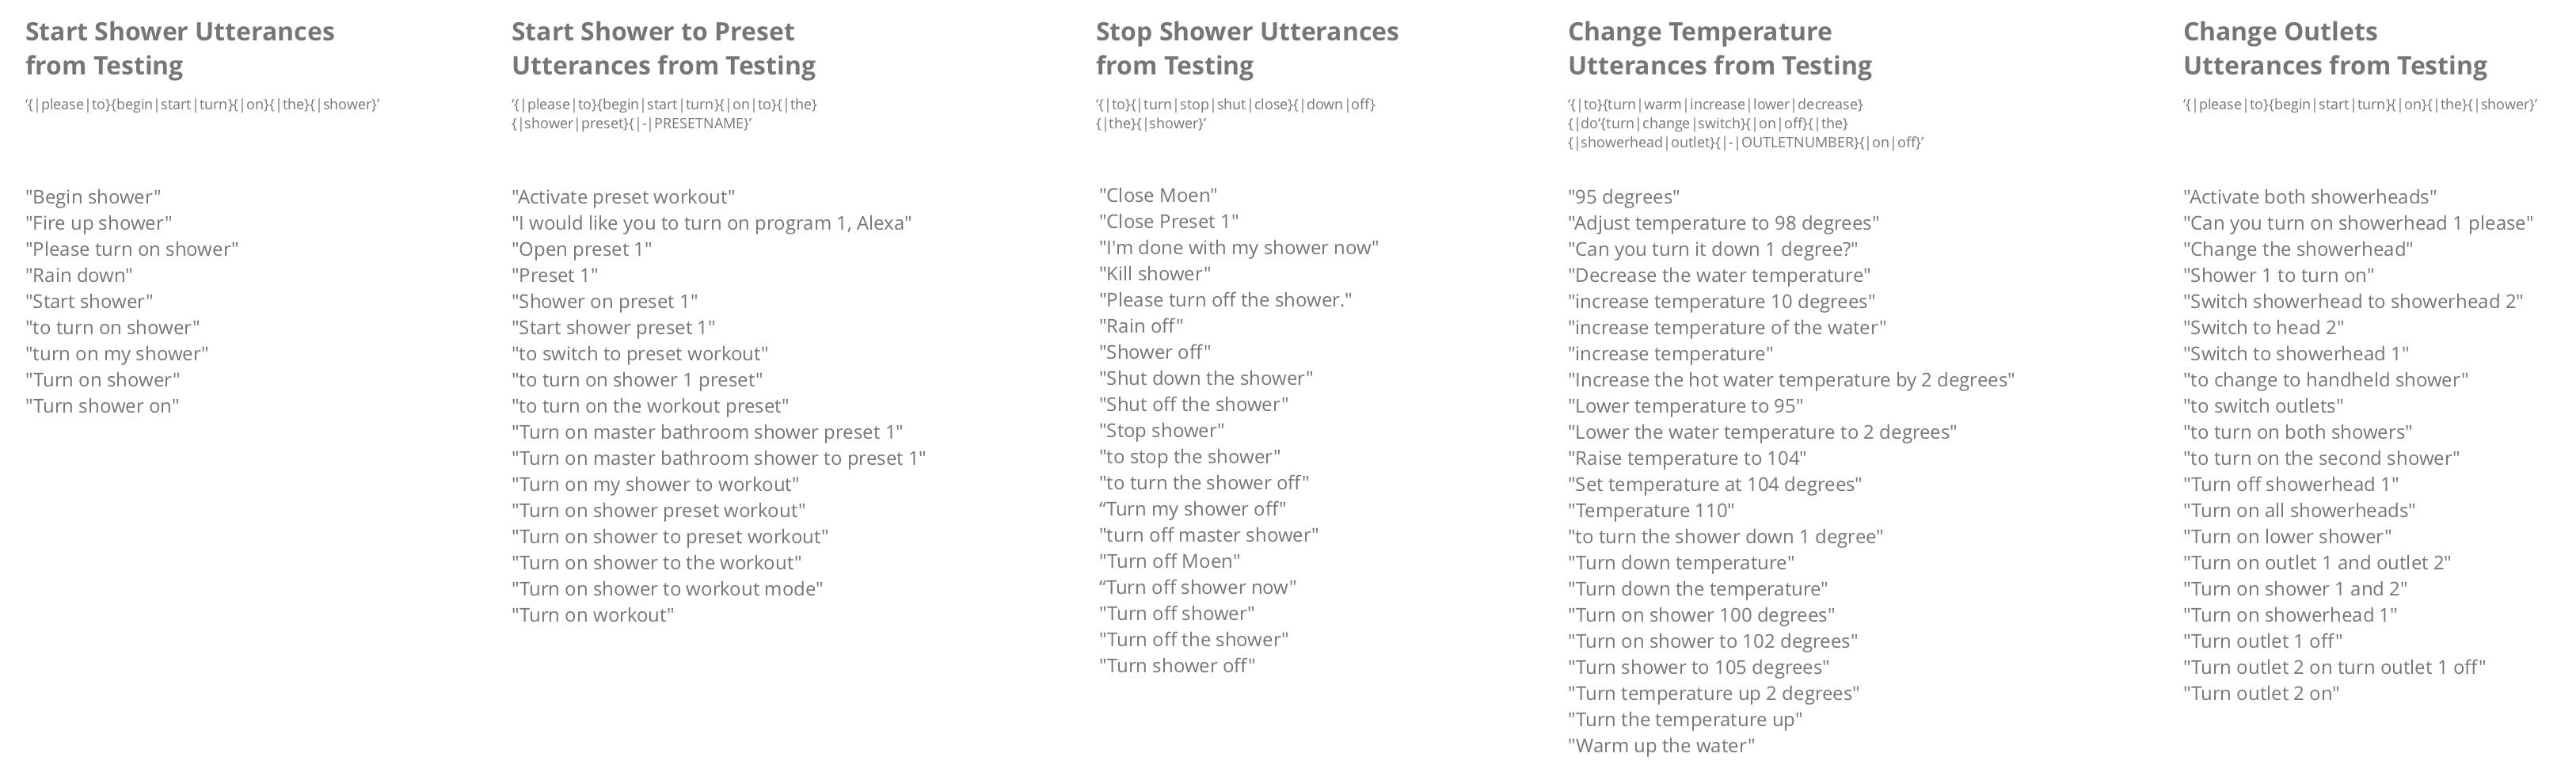 Utterance Patterns